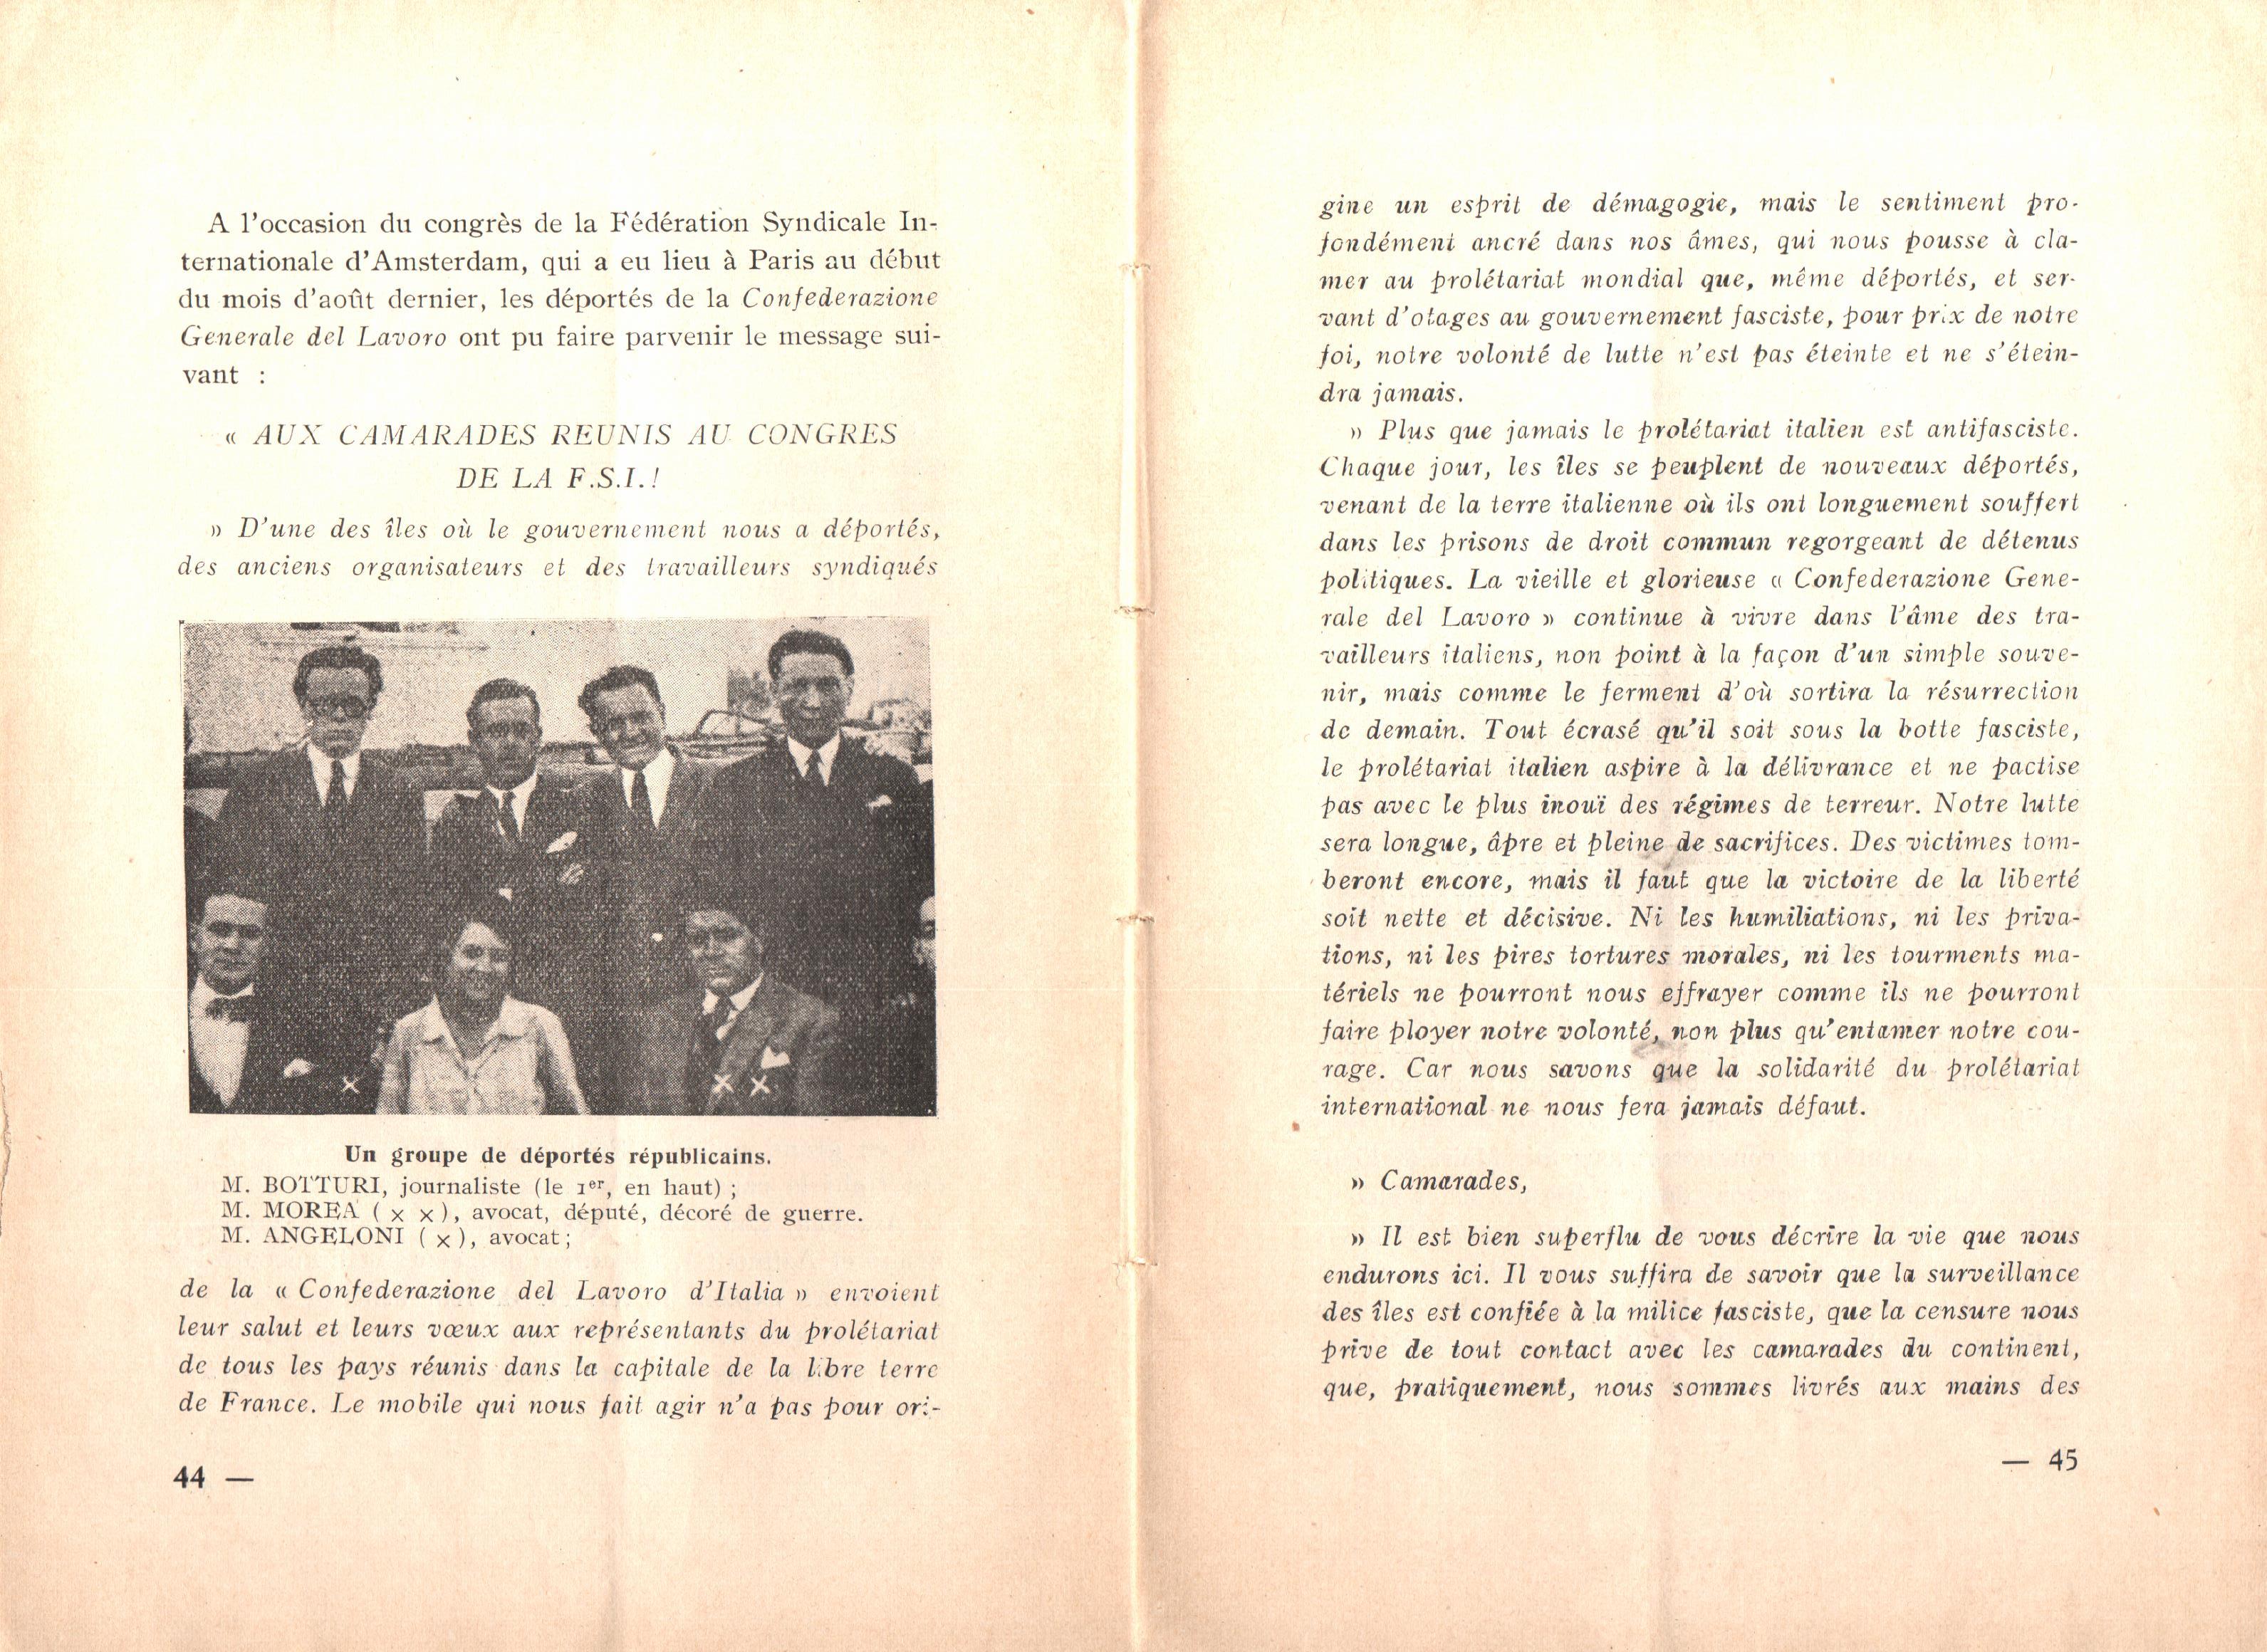 Nicola Cilla, Les «Cayennes» d'Italie - pag. 24